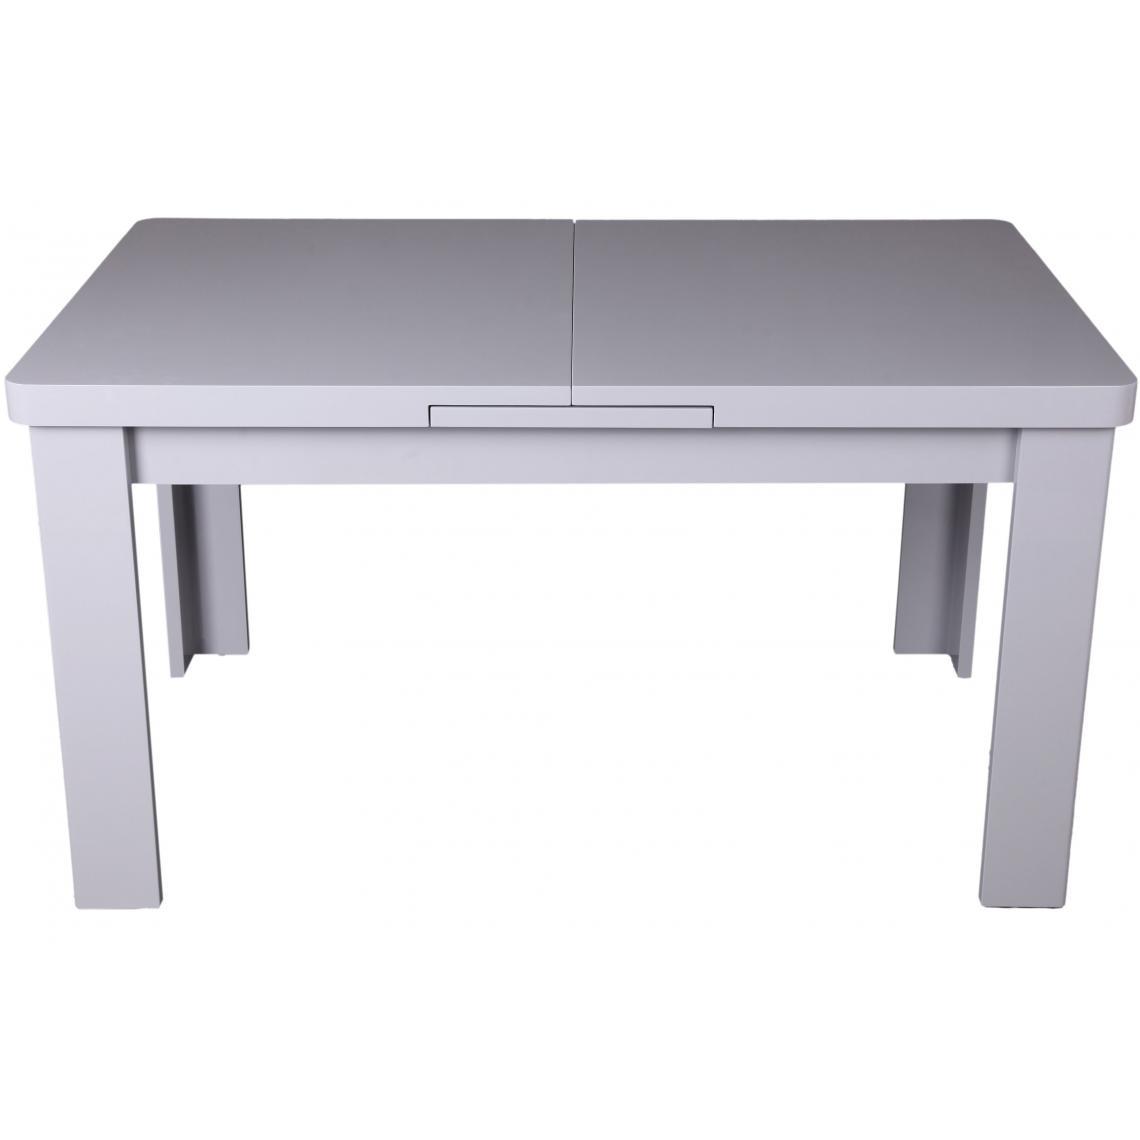 table a manger extensible grise minerve